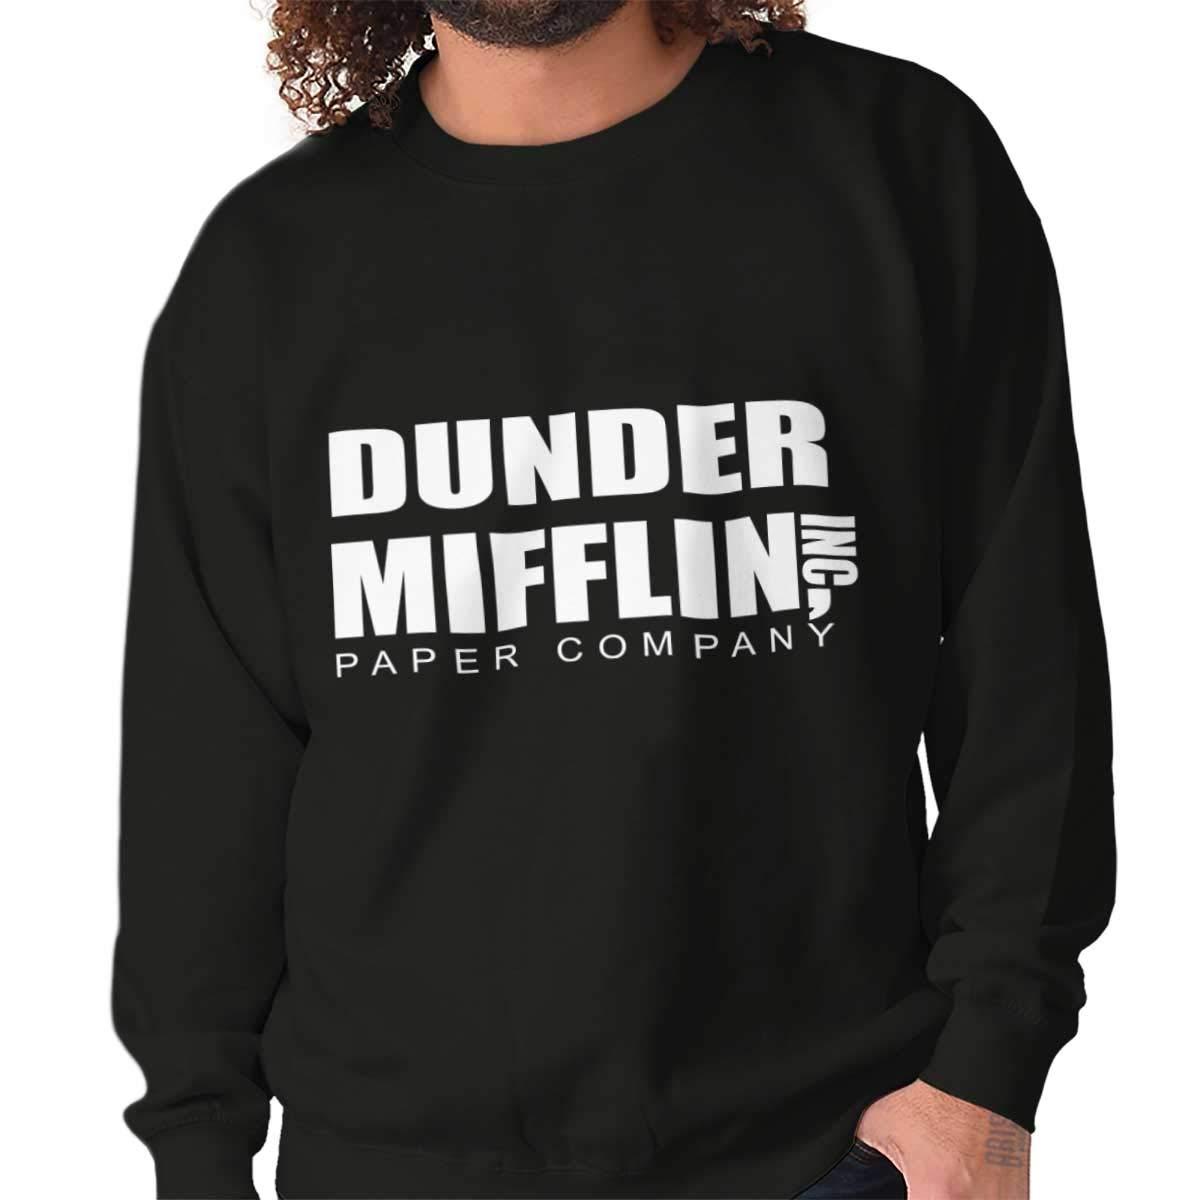 f446befd Brisco Brands Dunder Paper Company Mifflin Office TV Show Crewneck  Sweatshirt product image